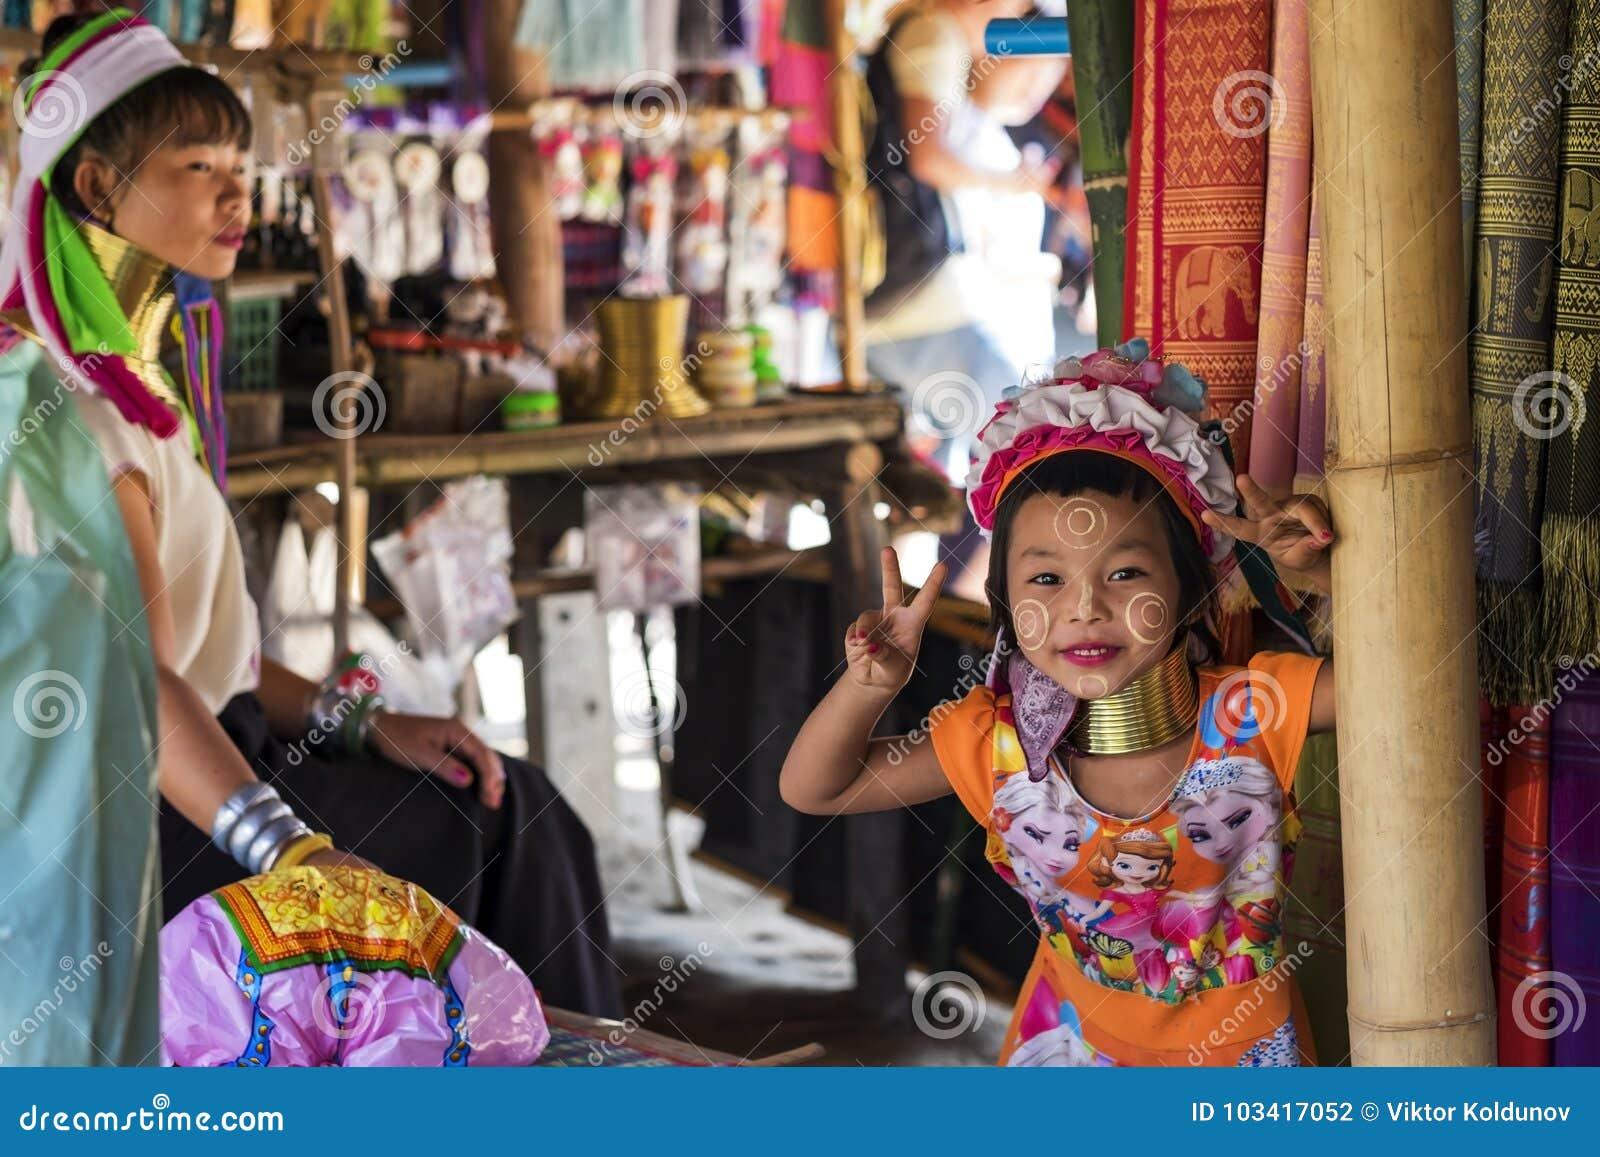 CHIANG RAI, THAILAND - NOVEMBER 4 2017: Unidentified Long Neck Karen hill tribe girl smiling